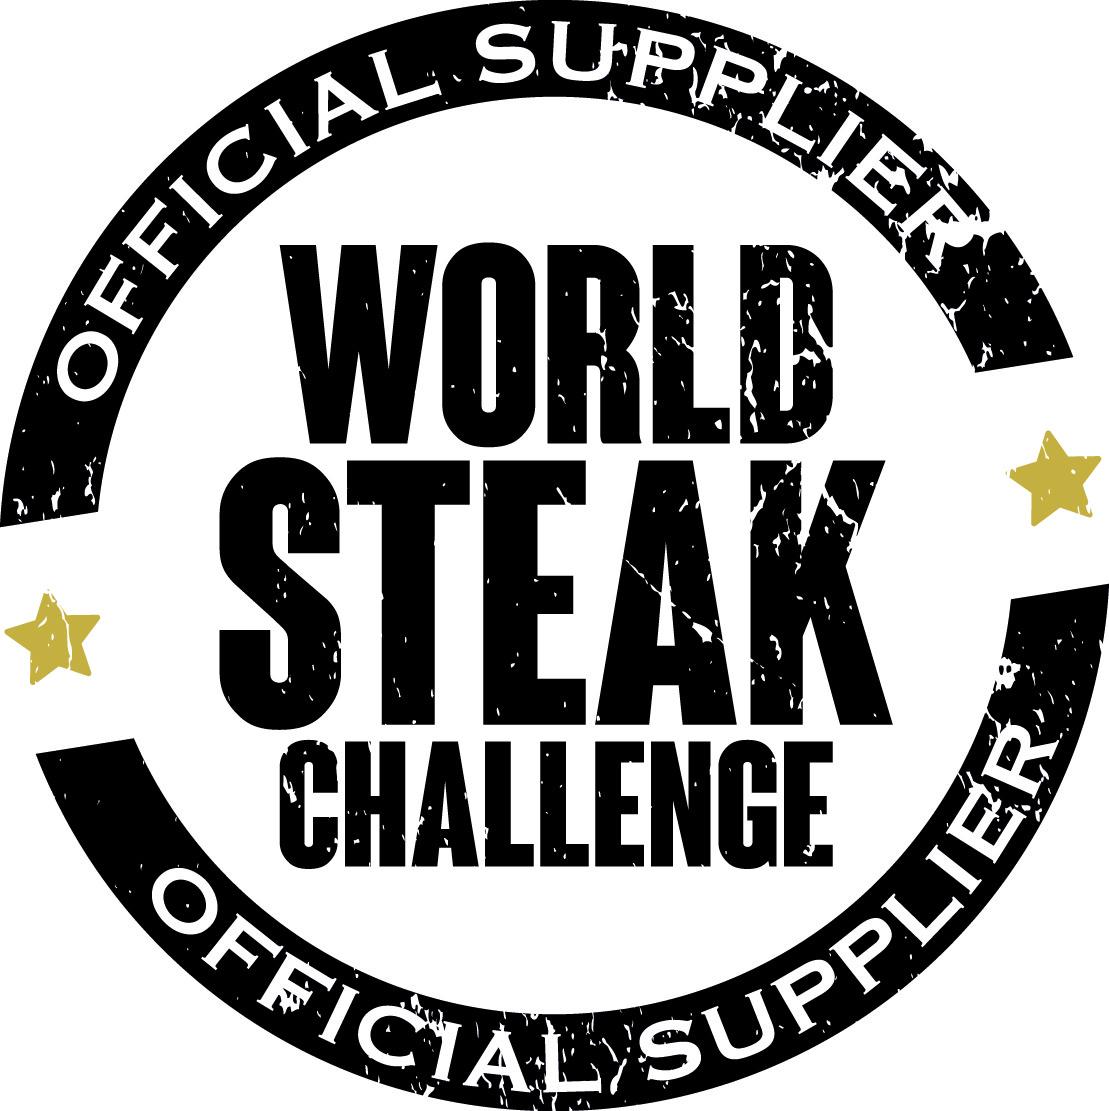 SteakStones - Official Supplier to The World Steak Challenge